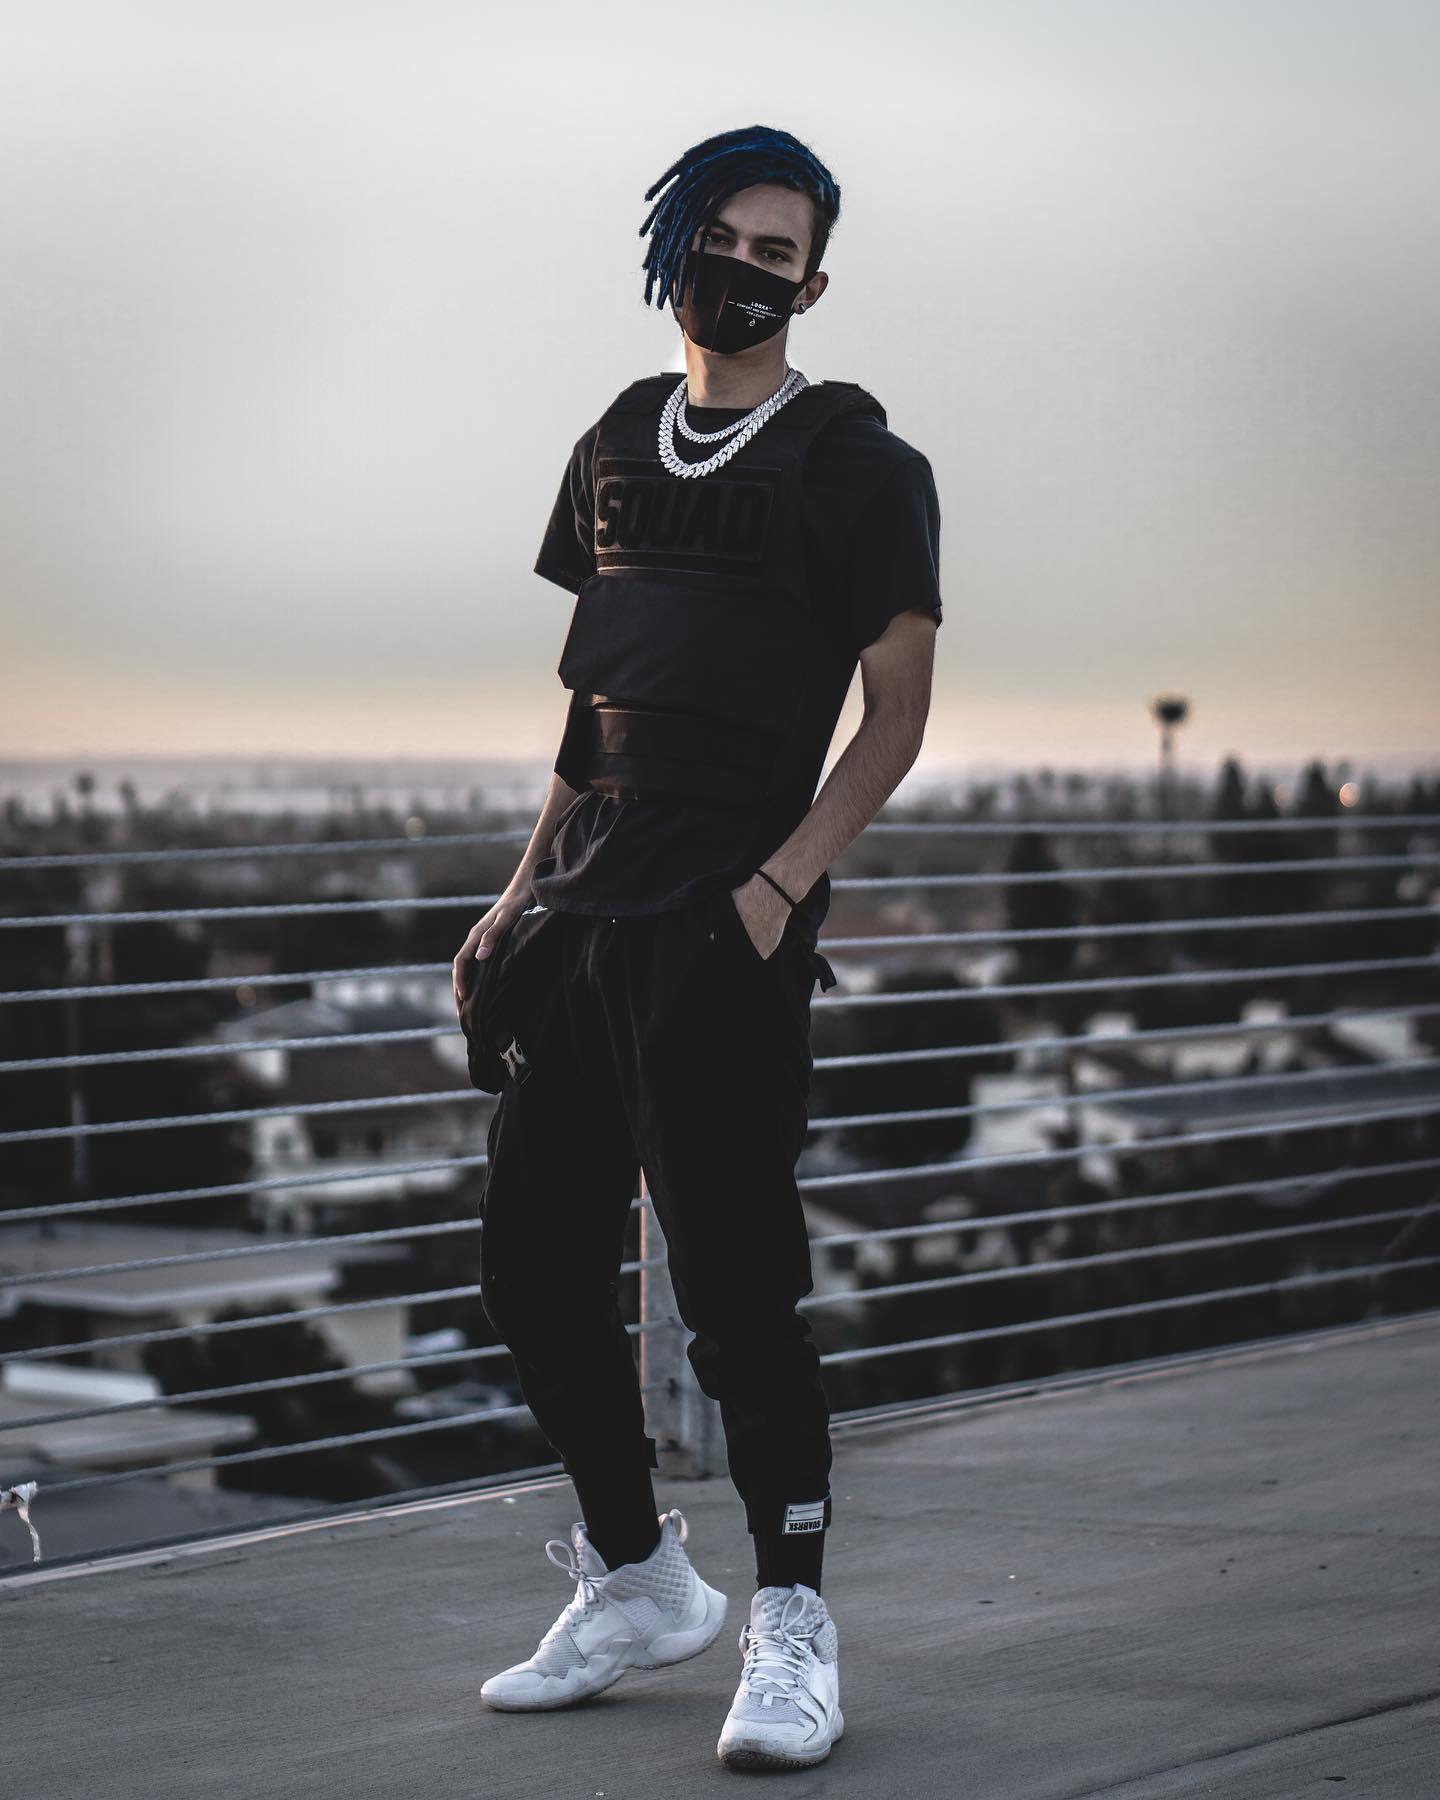 Streetwear Techwear -rudolph.mendez